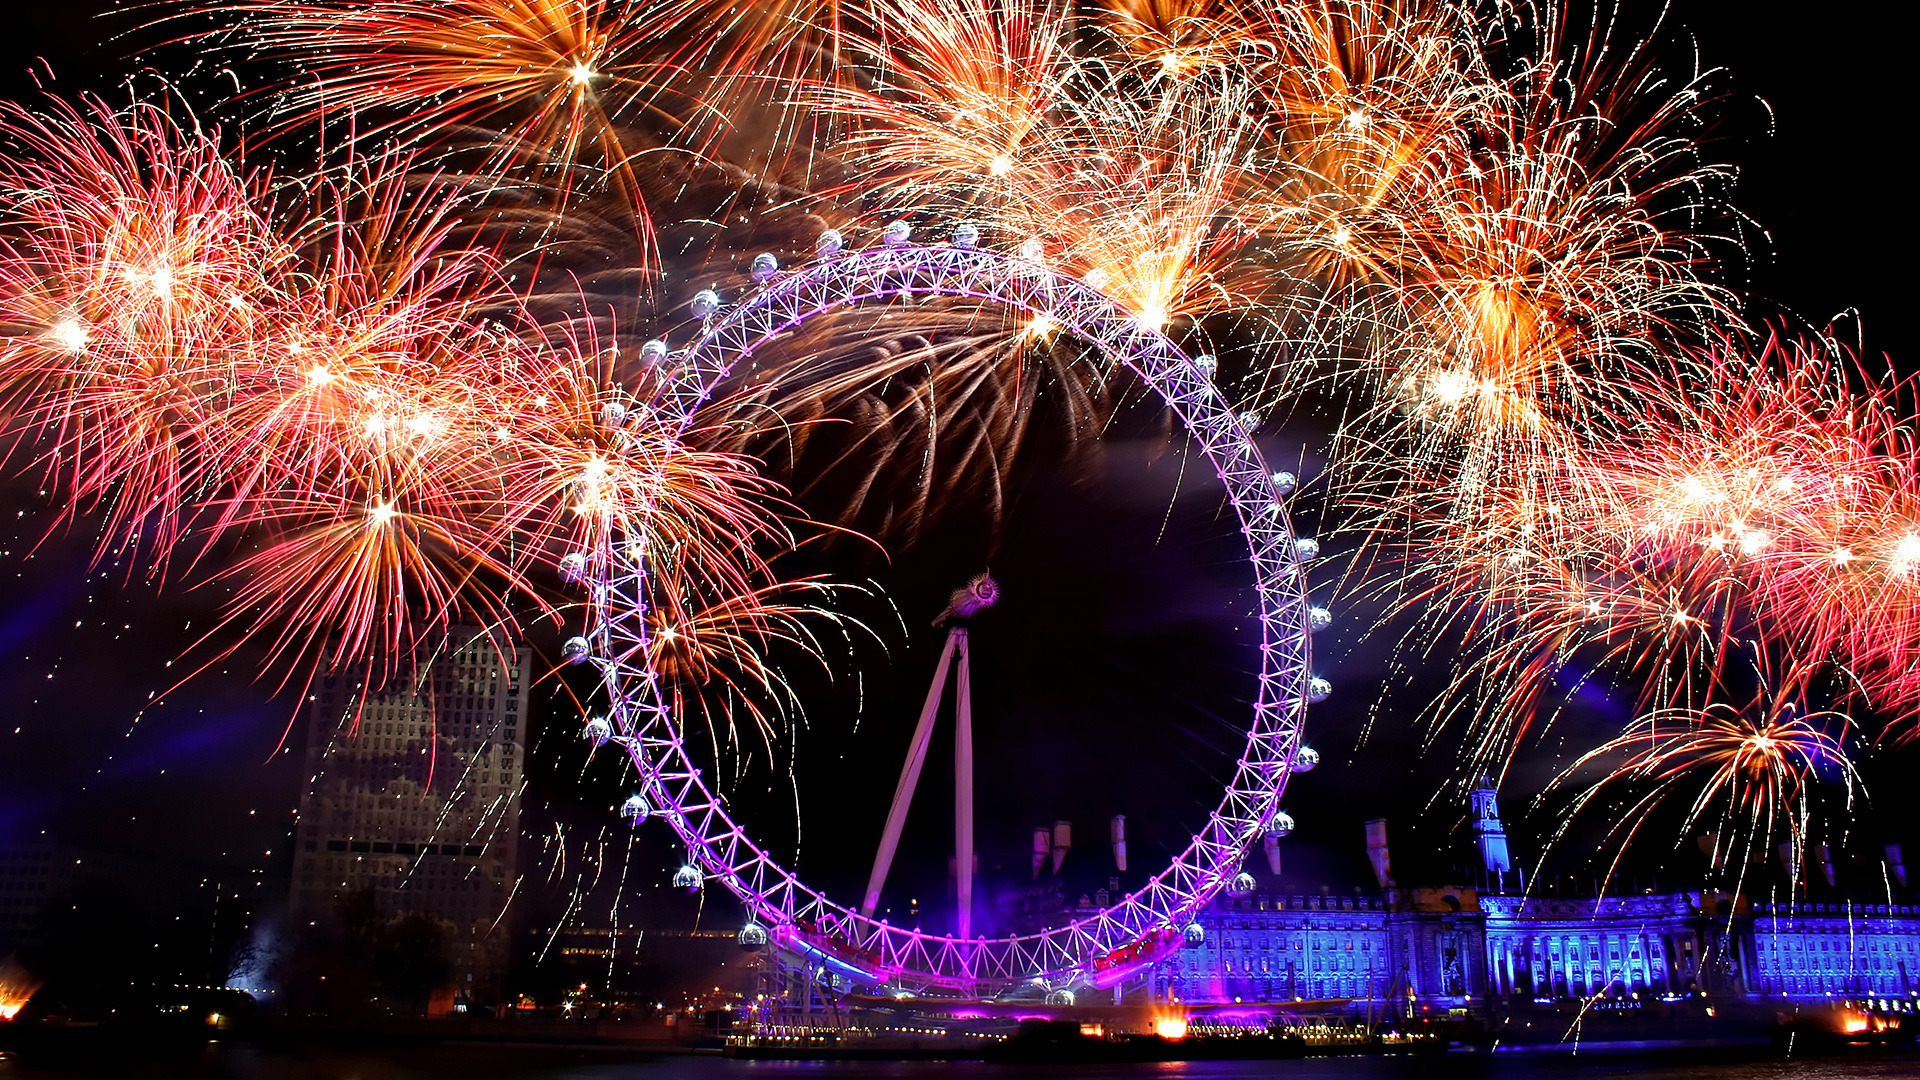 Animated Fireworks Wallpaper - WallpaperSafari